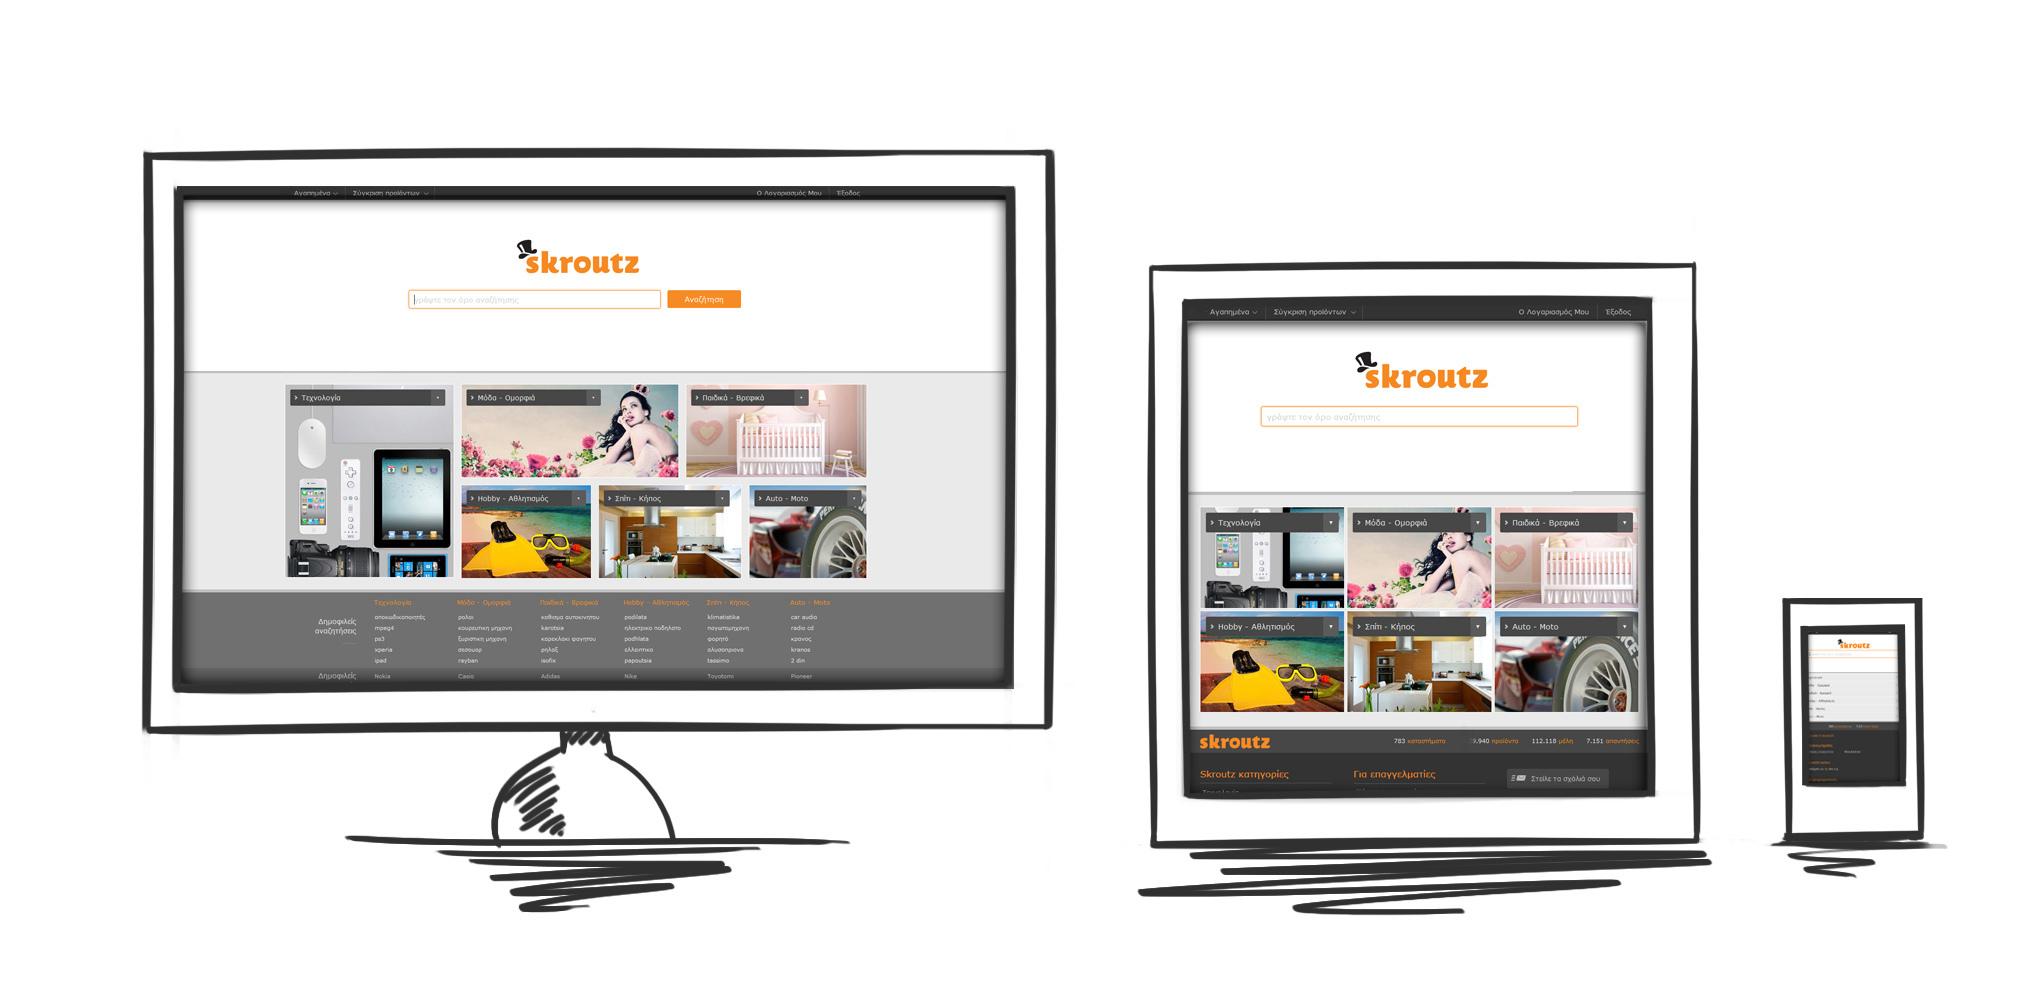 Skroutz Responsive Web Design